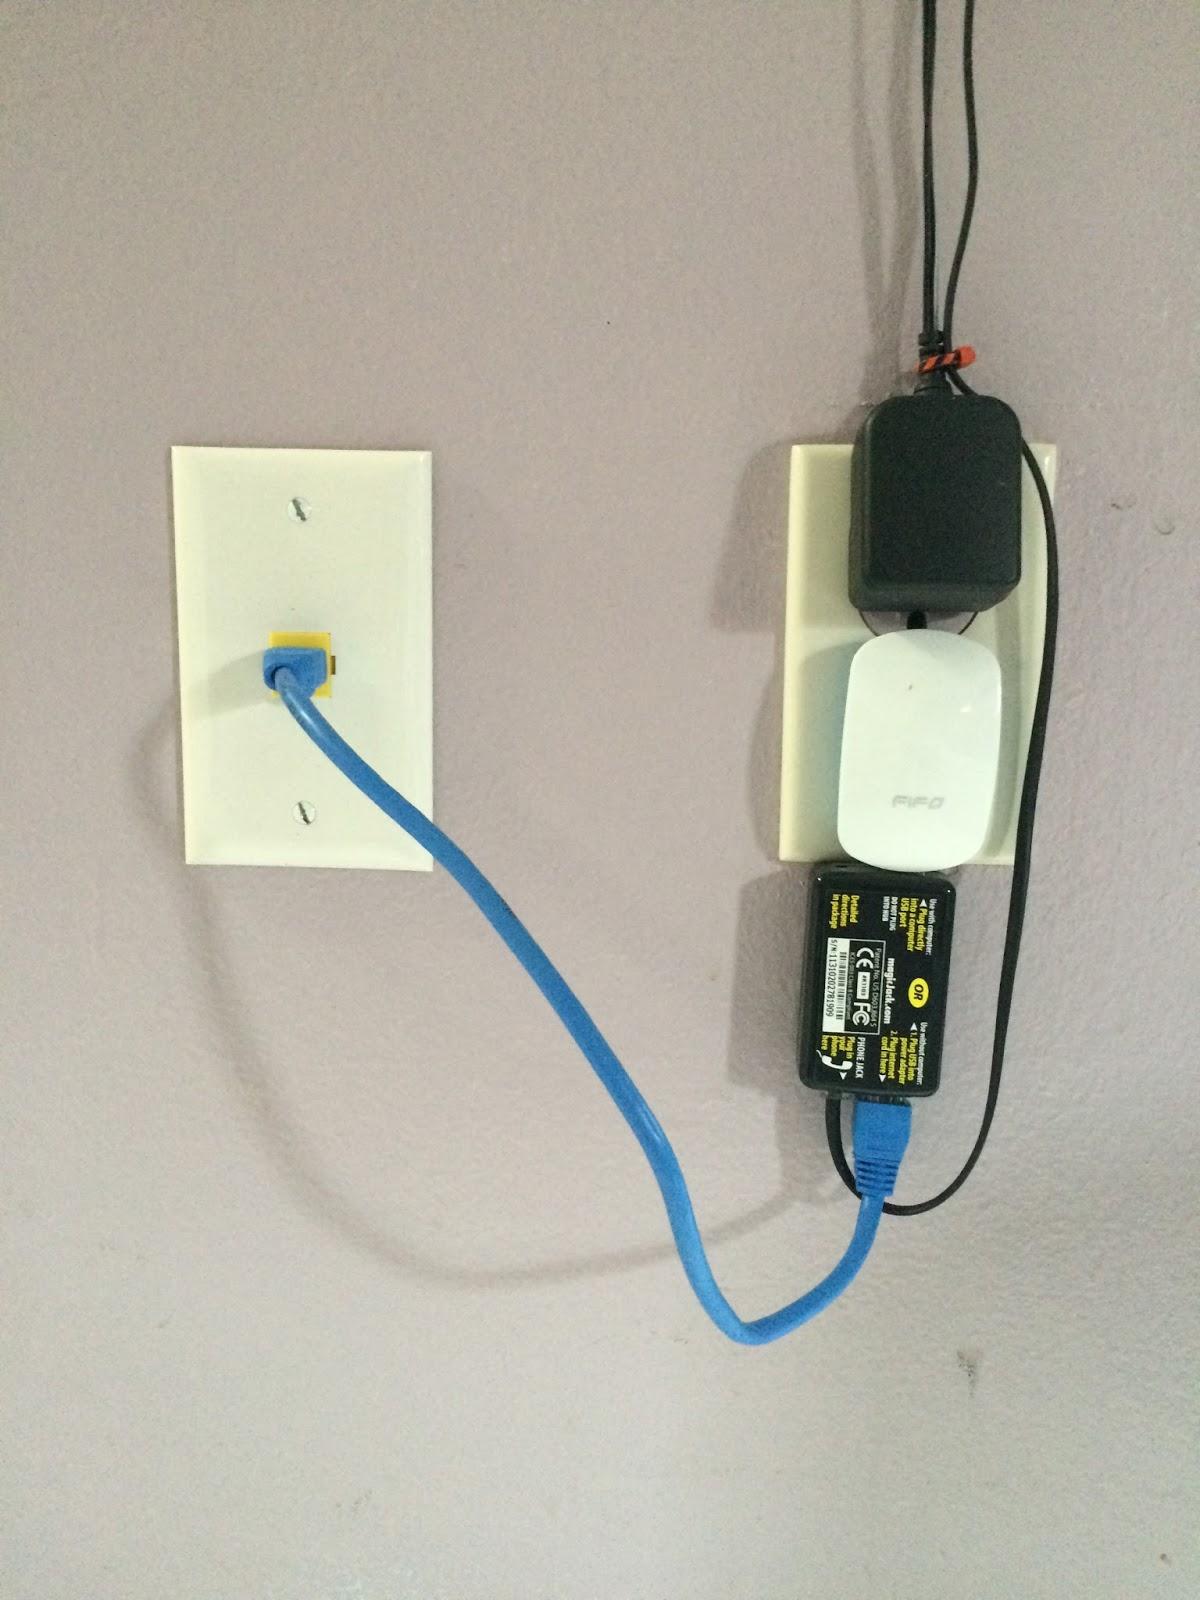 medium resolution of magic jack wiring diagram wiring diagram view magic jack wiring diagram